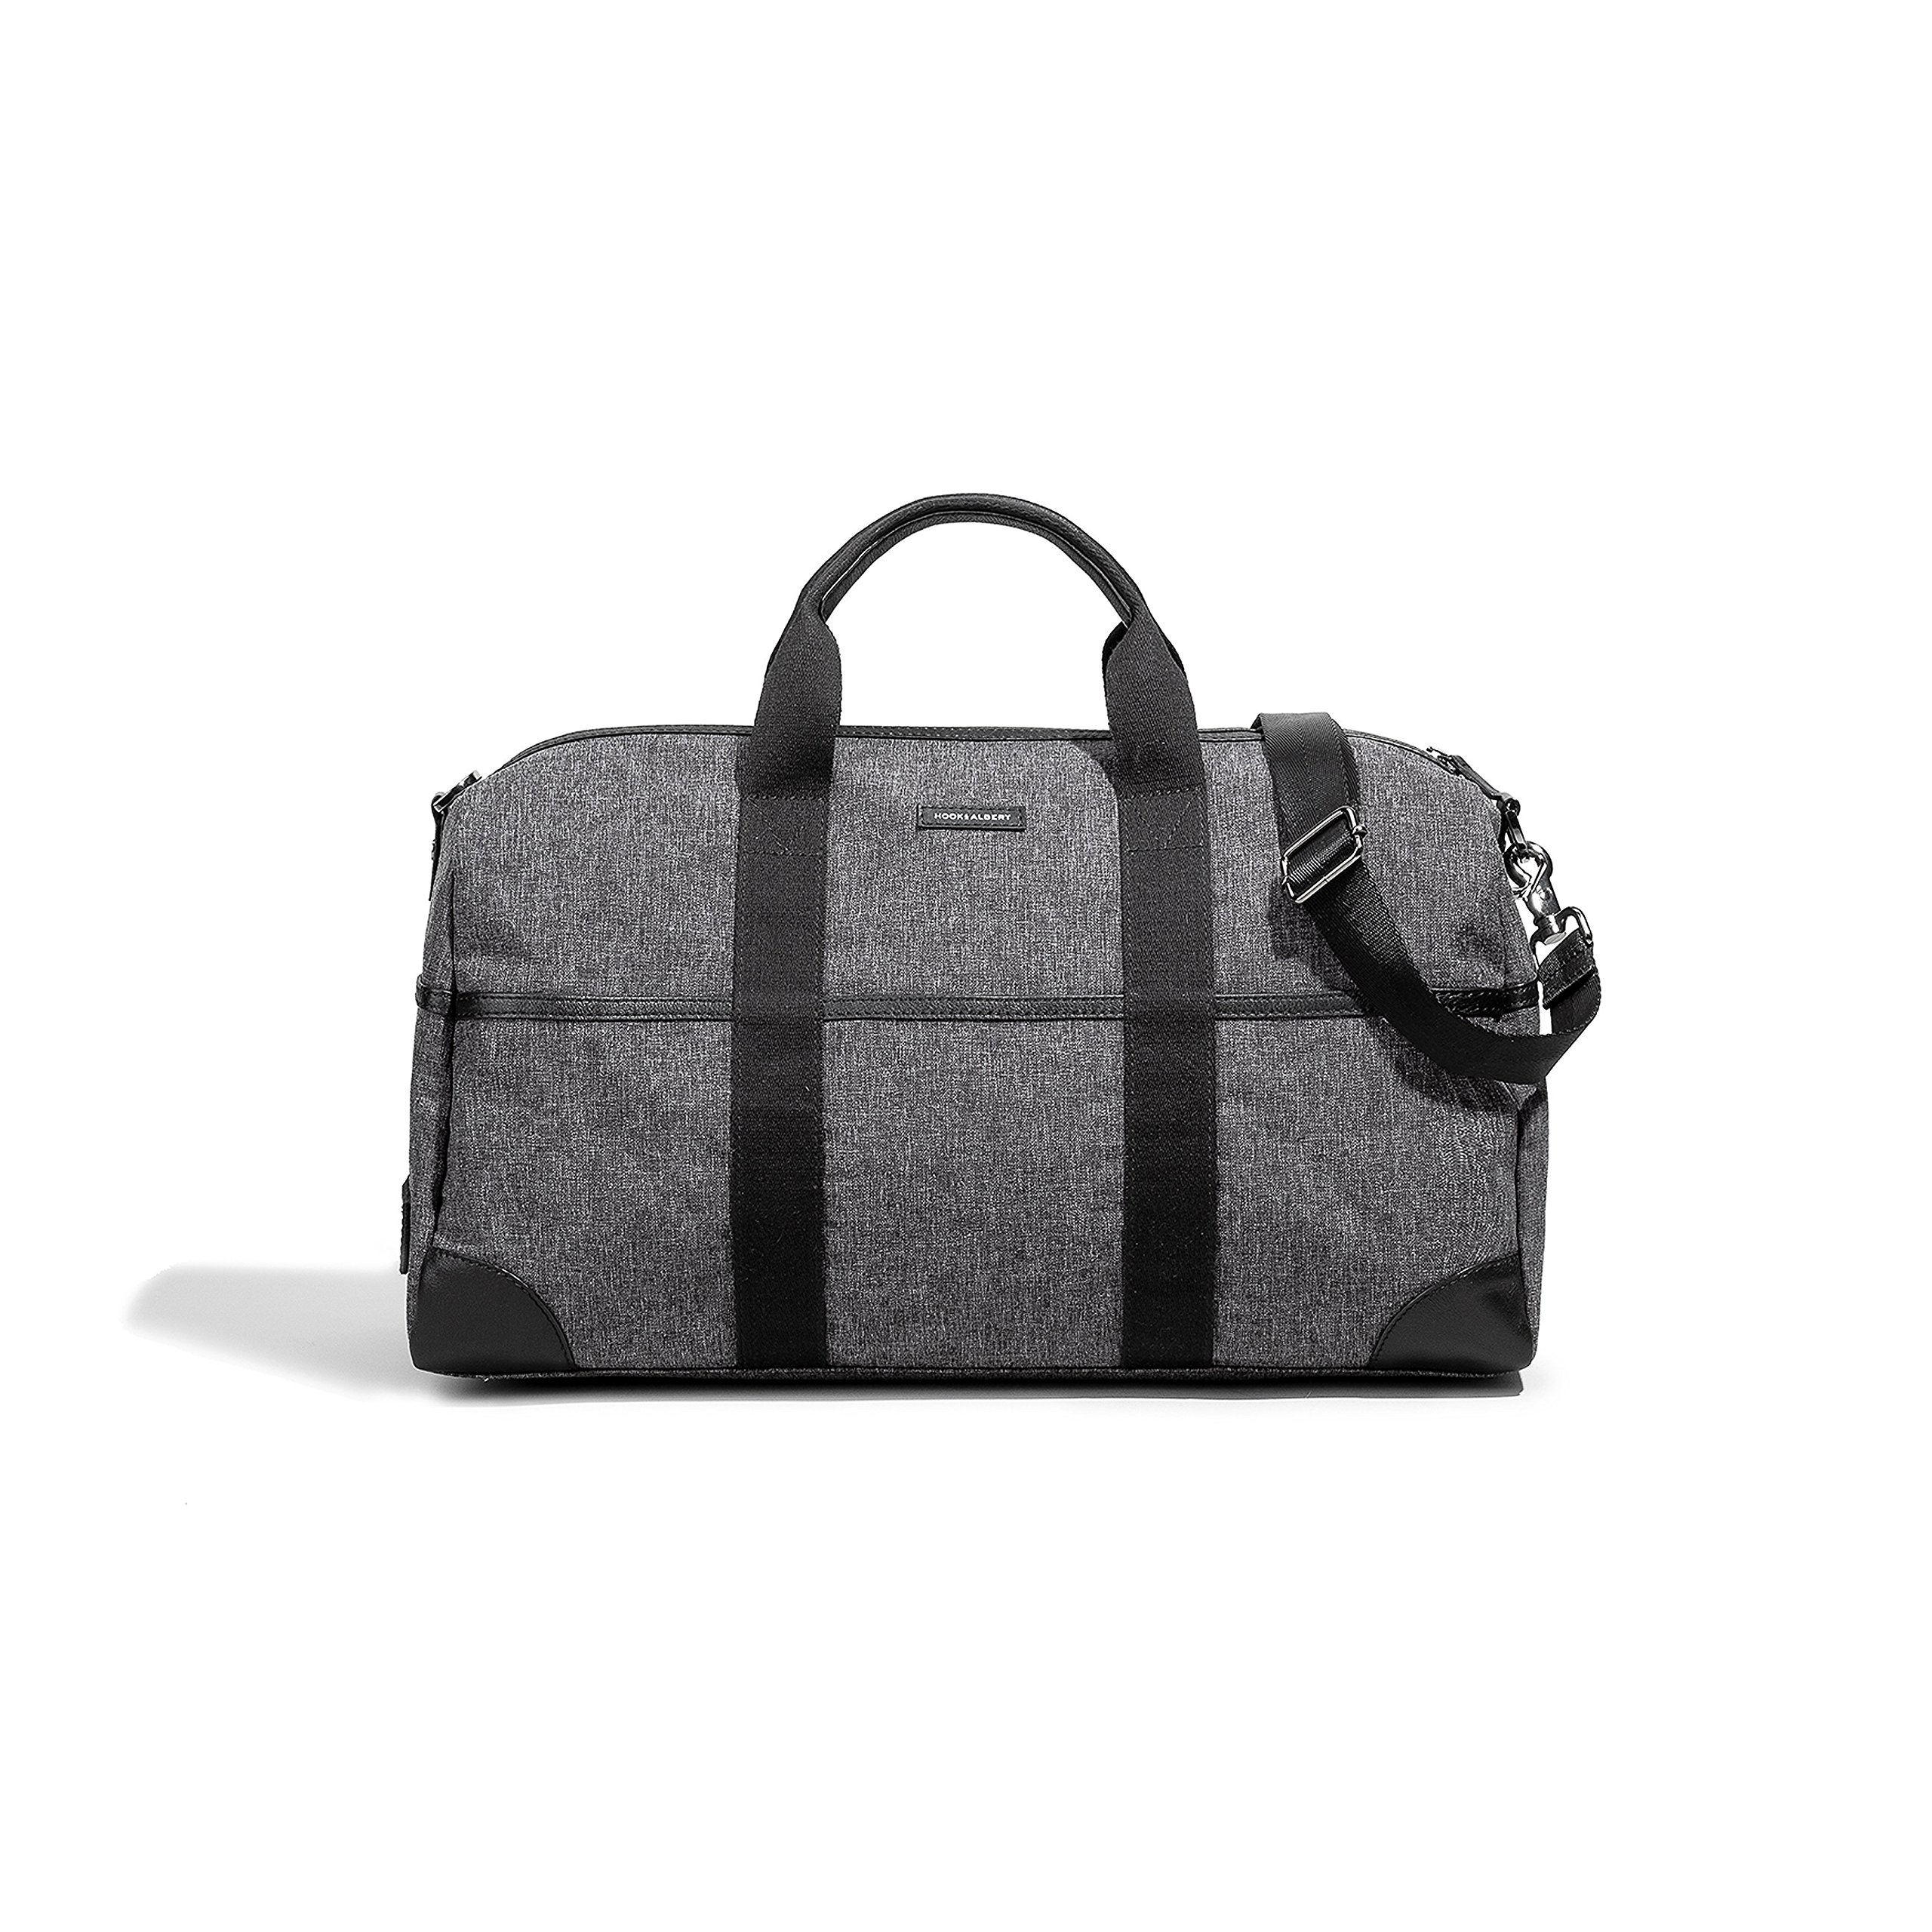 The Training Duffel Melange Fabric Bag by Hook & Albert